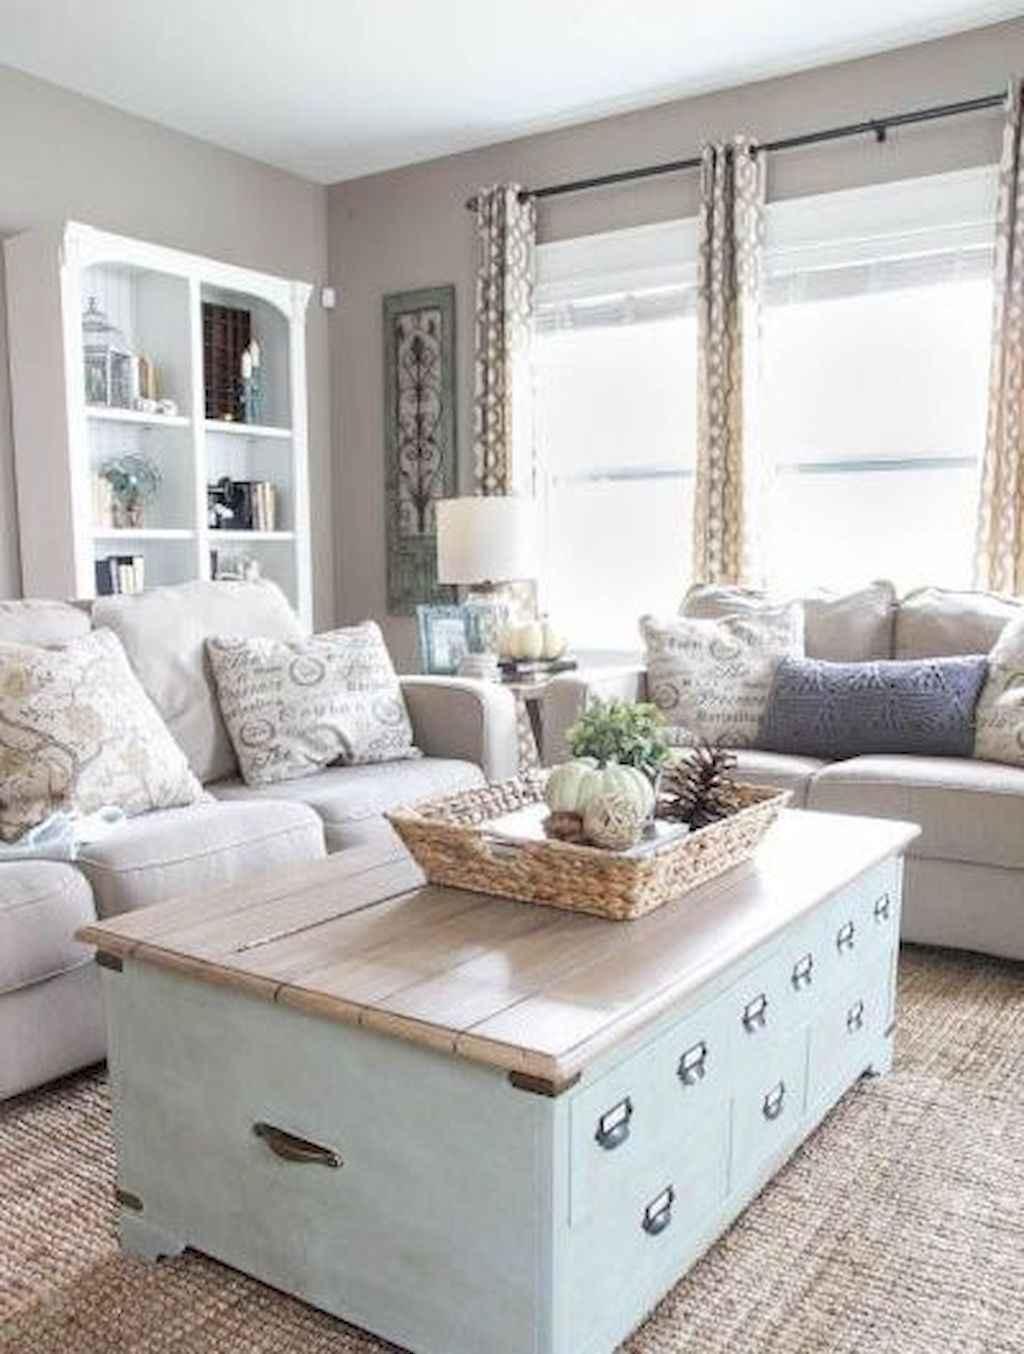 Romantic shabby chic living room decoration ideas (4)